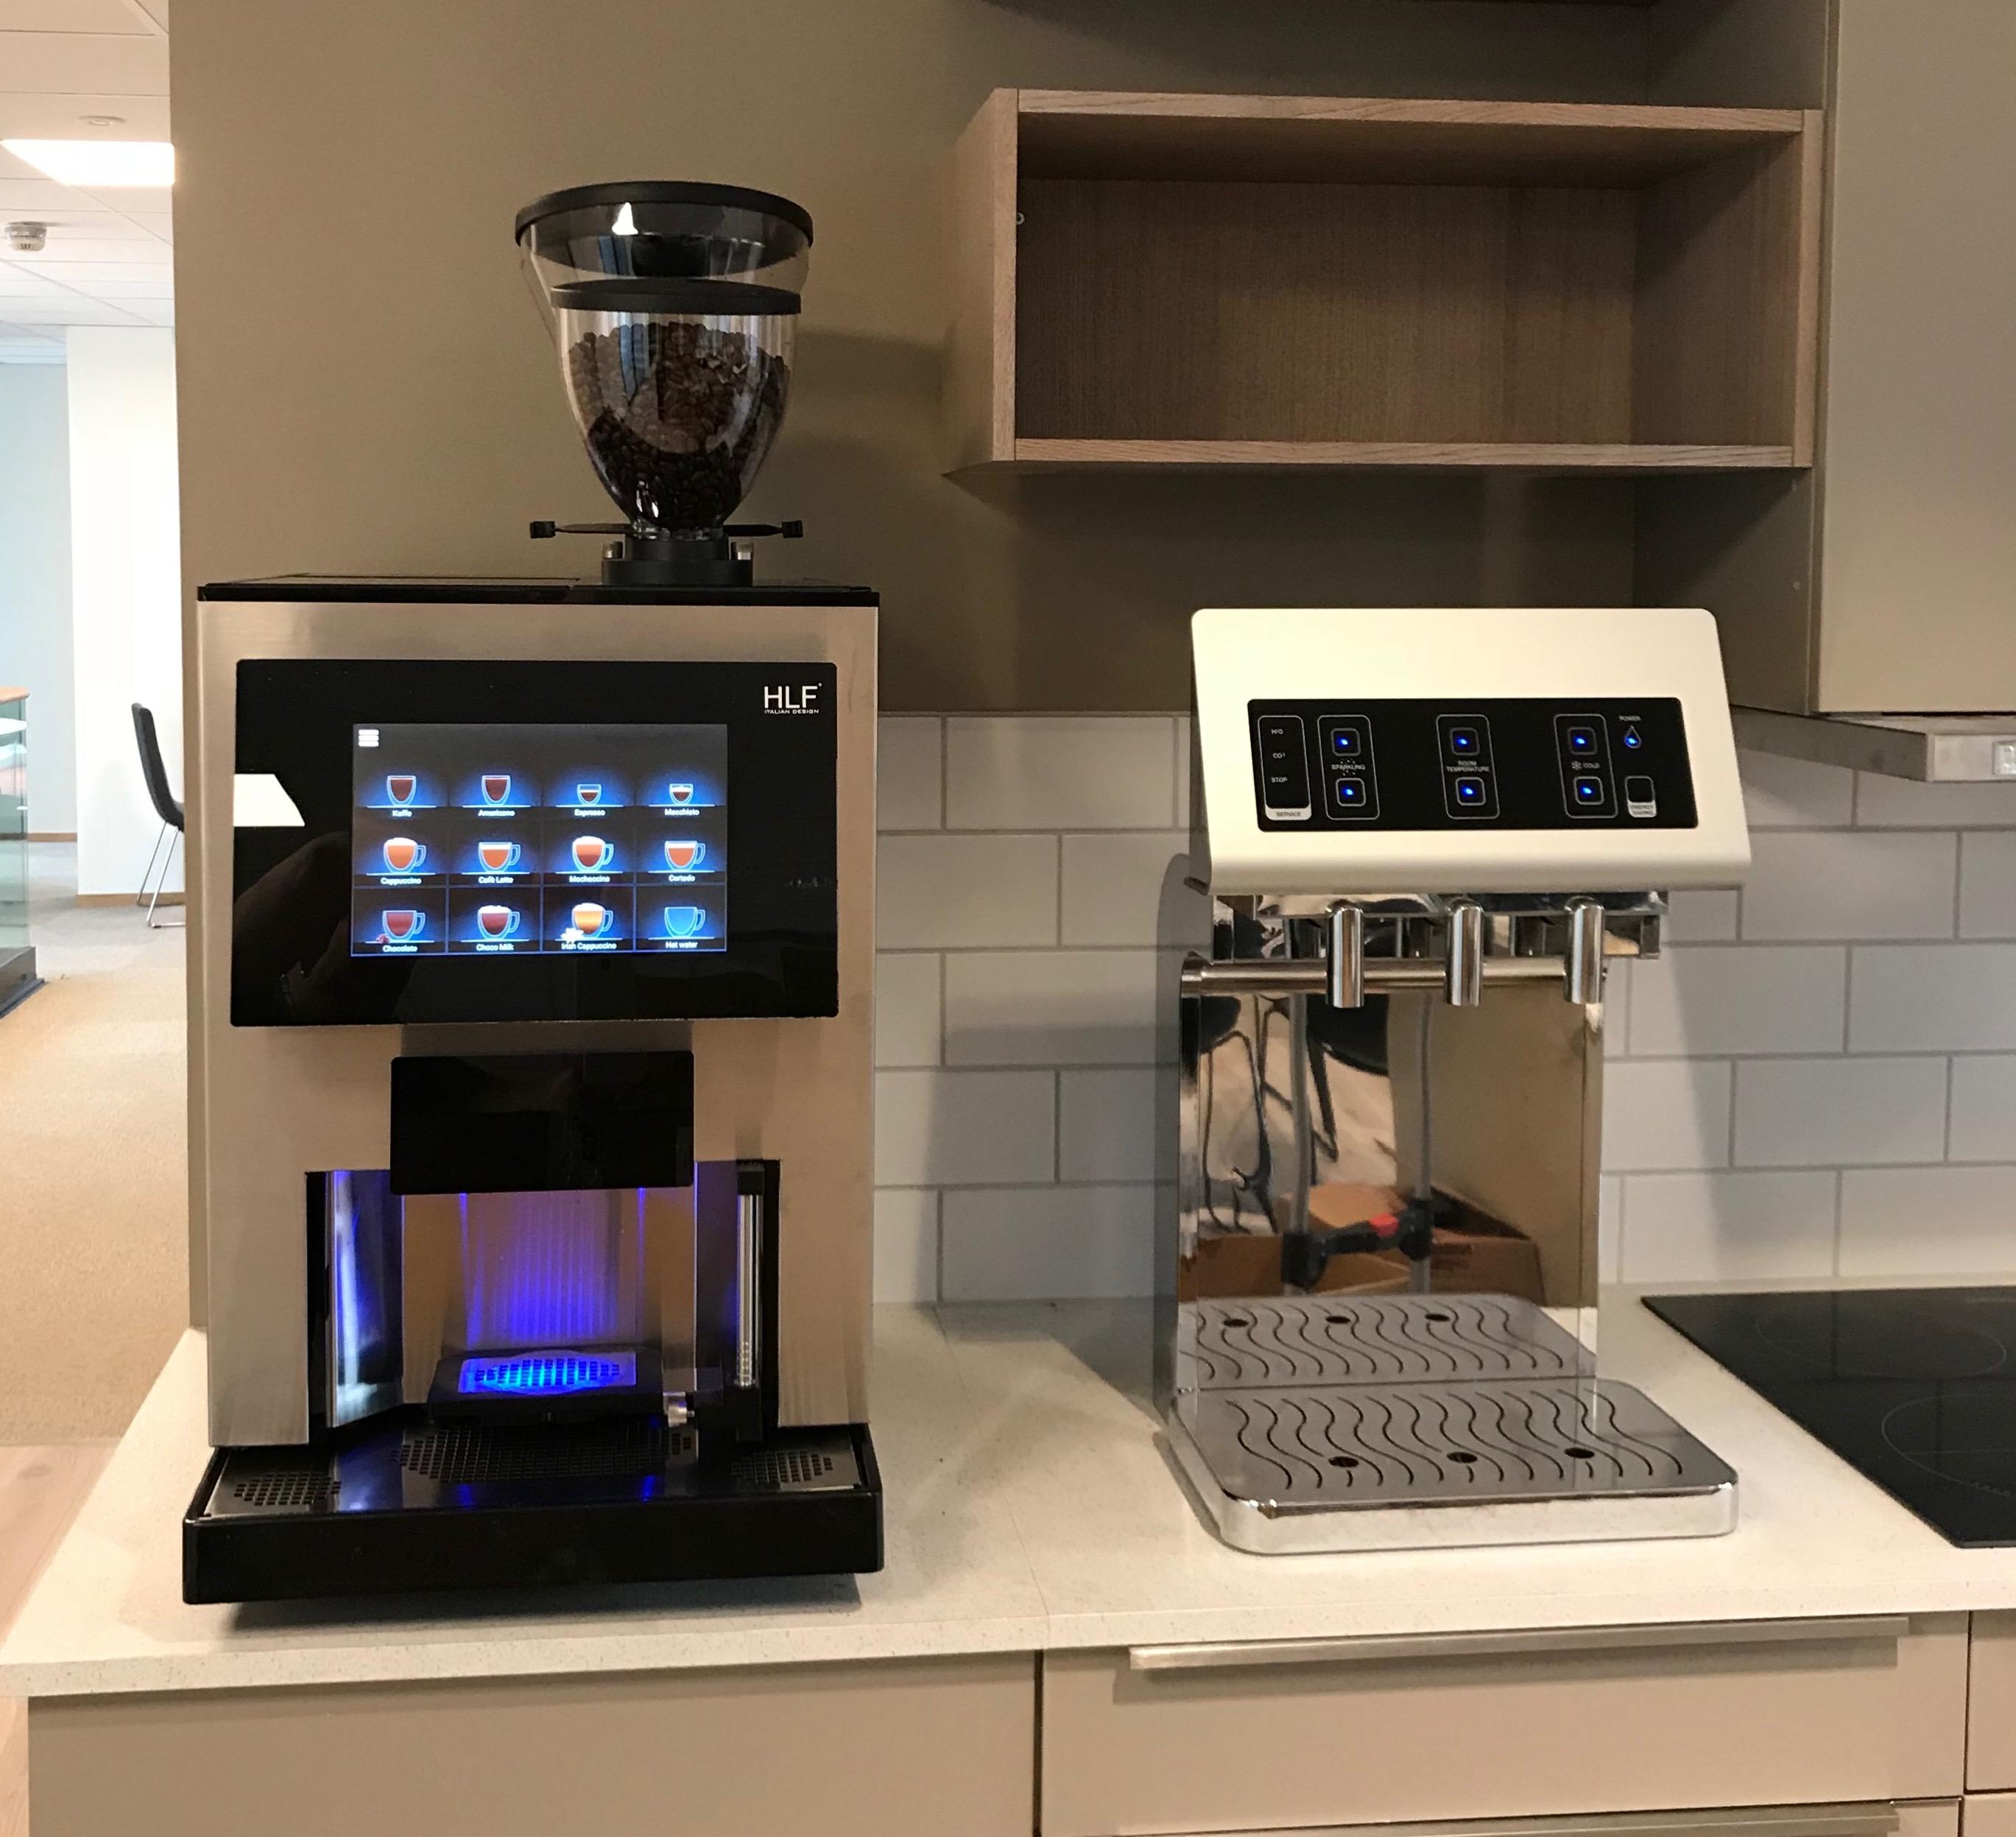 Kaffe Compagniet AS HLF 3700 og Blupura